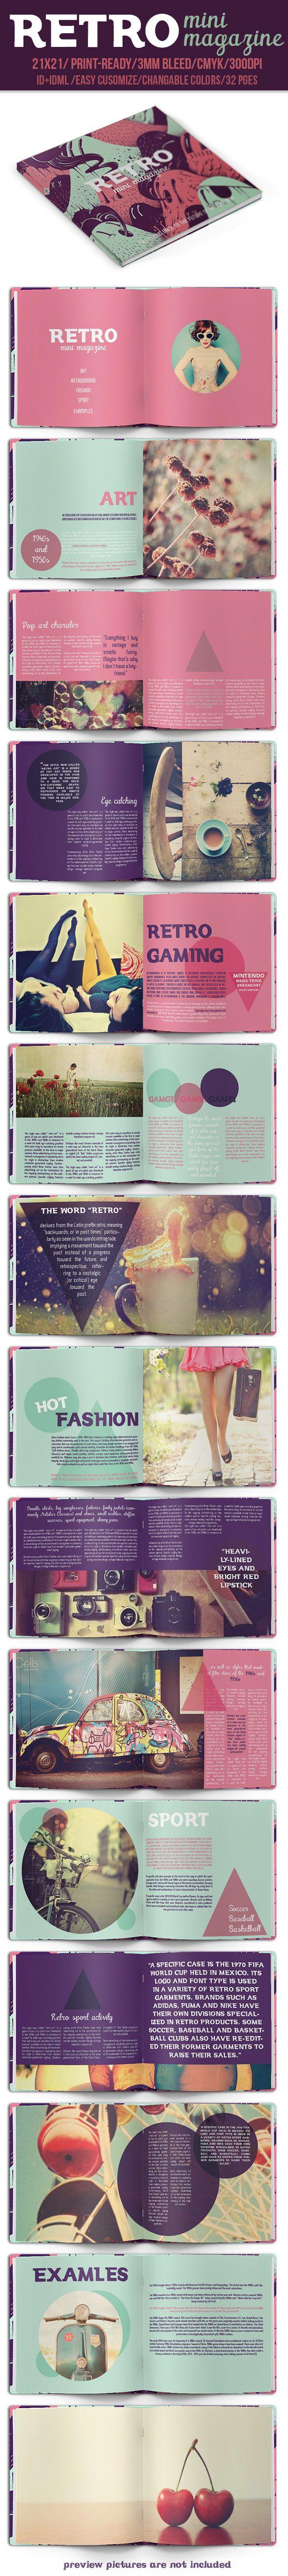 Retro Mini Magazine by crew55design, via Behance